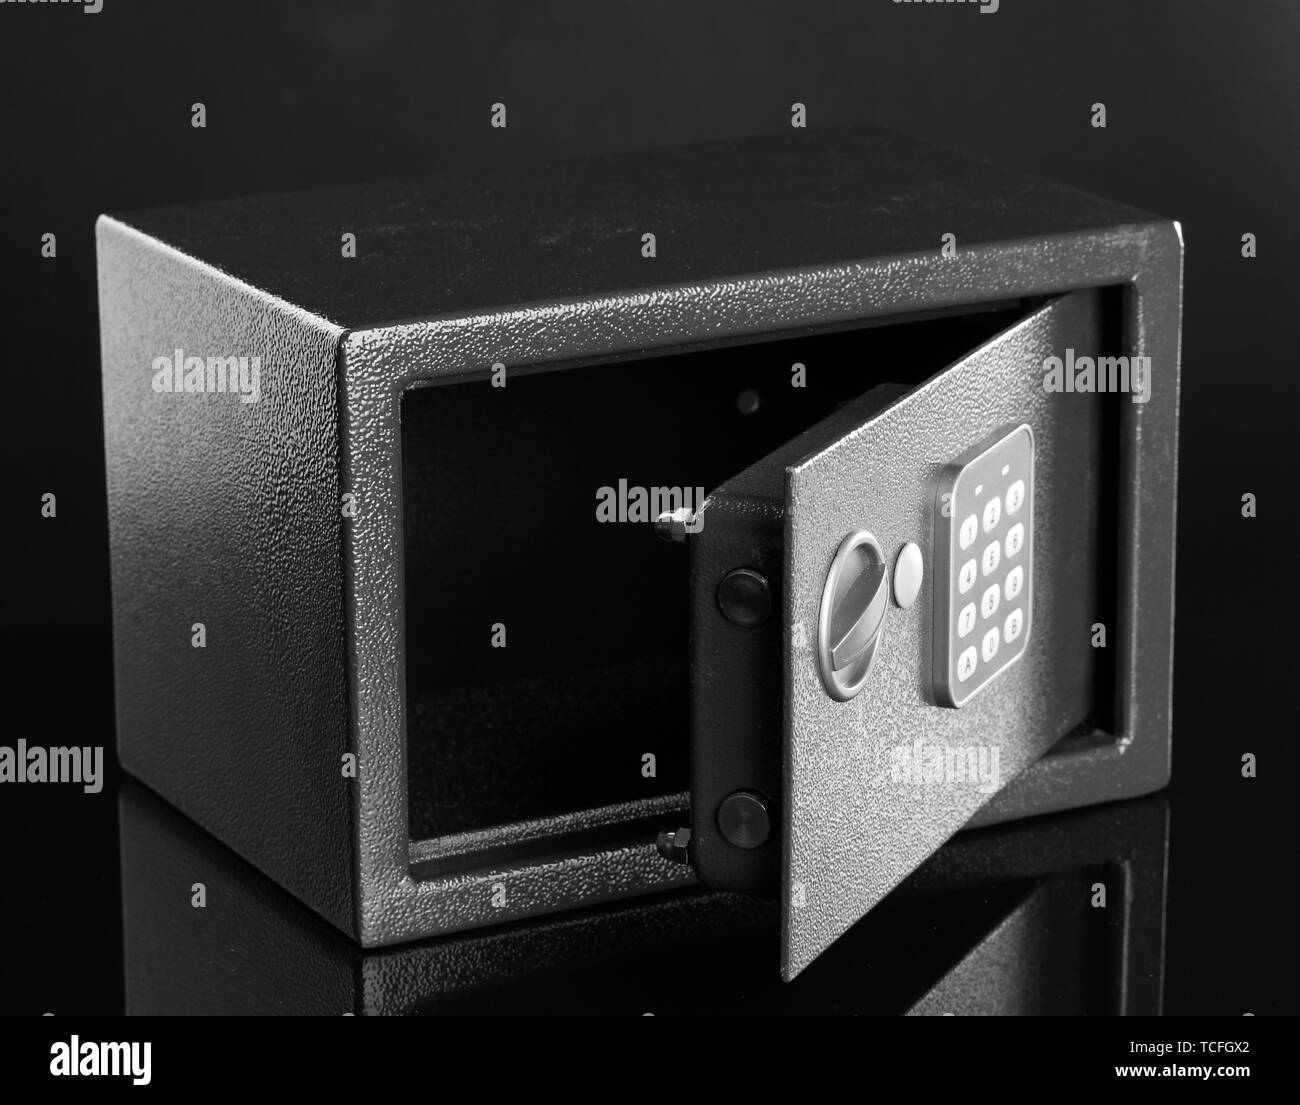 safe on black background - Stock Image